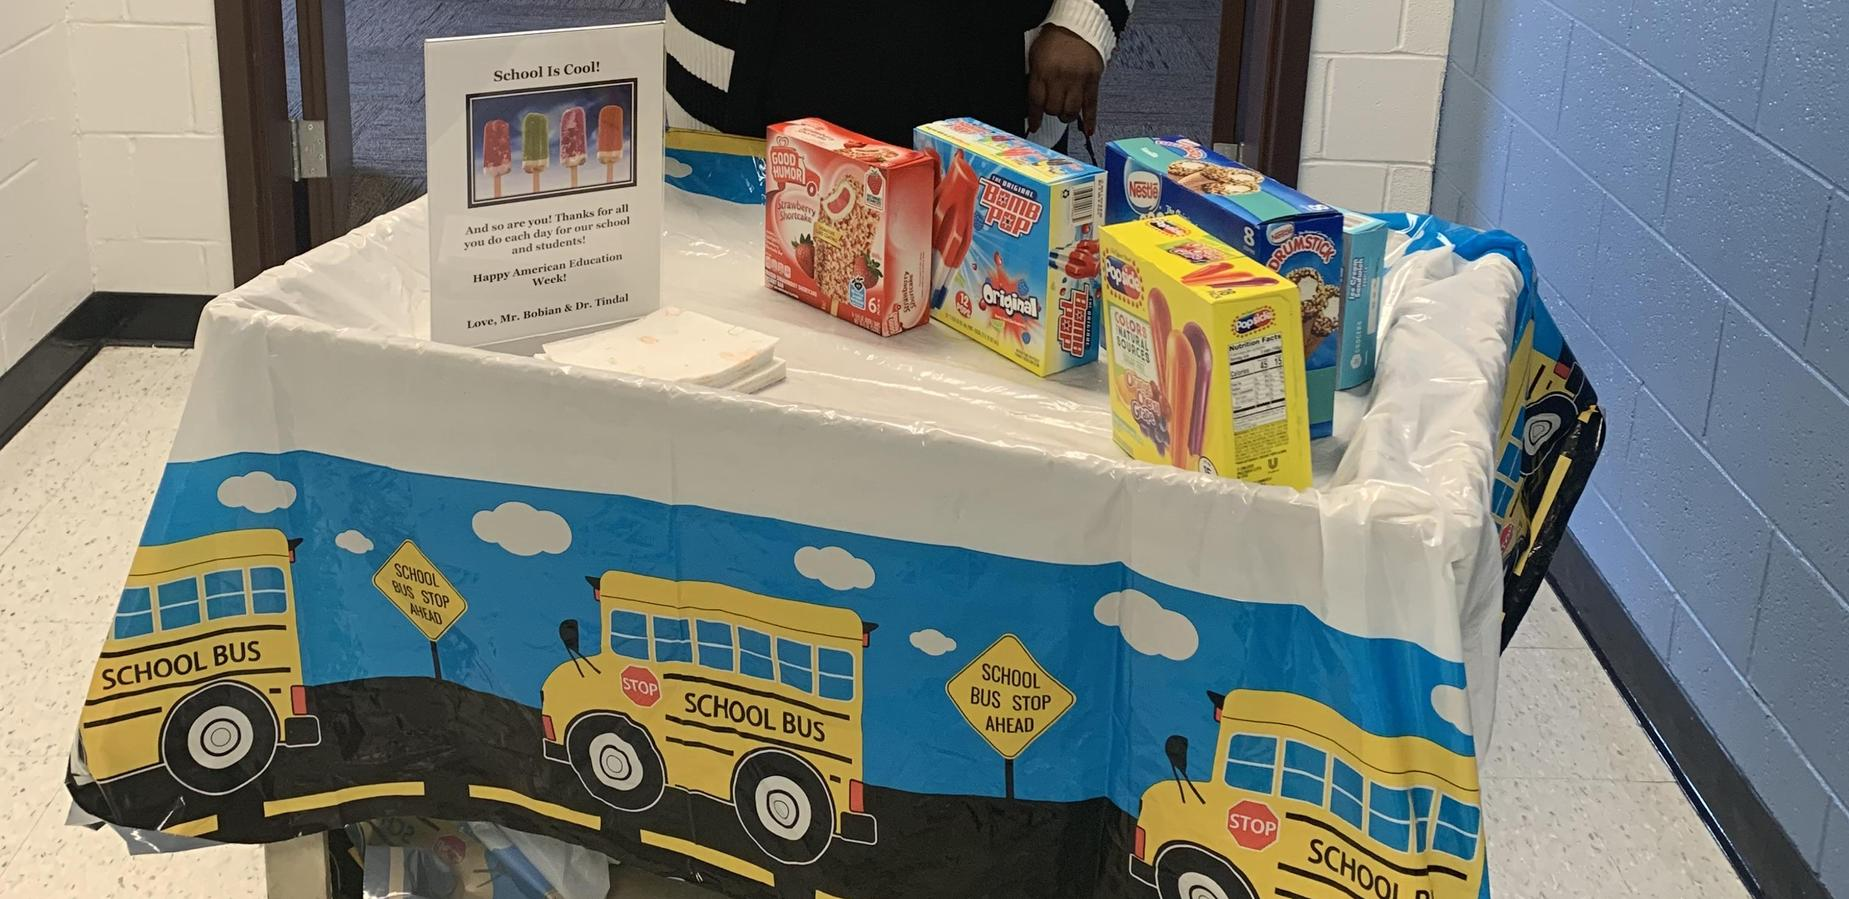 Dr. Tindal's sweet treat cart celebrating staff during American Education Week